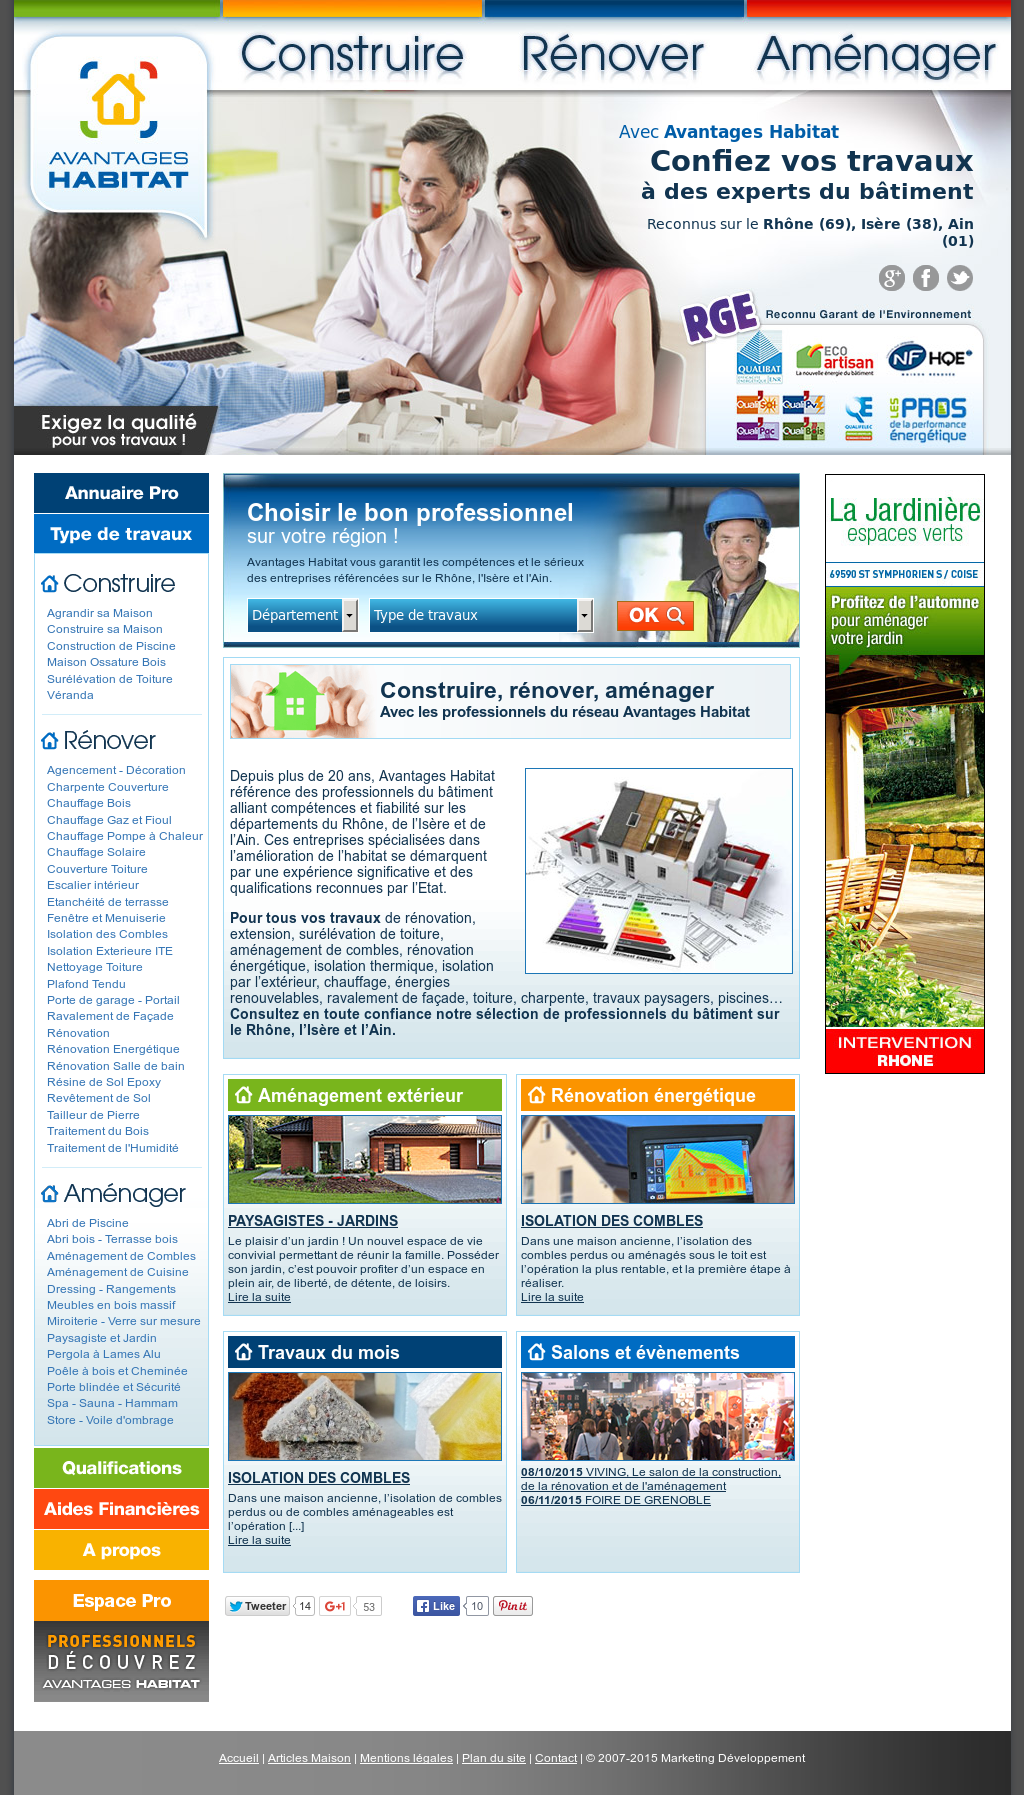 Construction Pergola Bois Plan avantageshabitat competitors, revenue and employees - owler